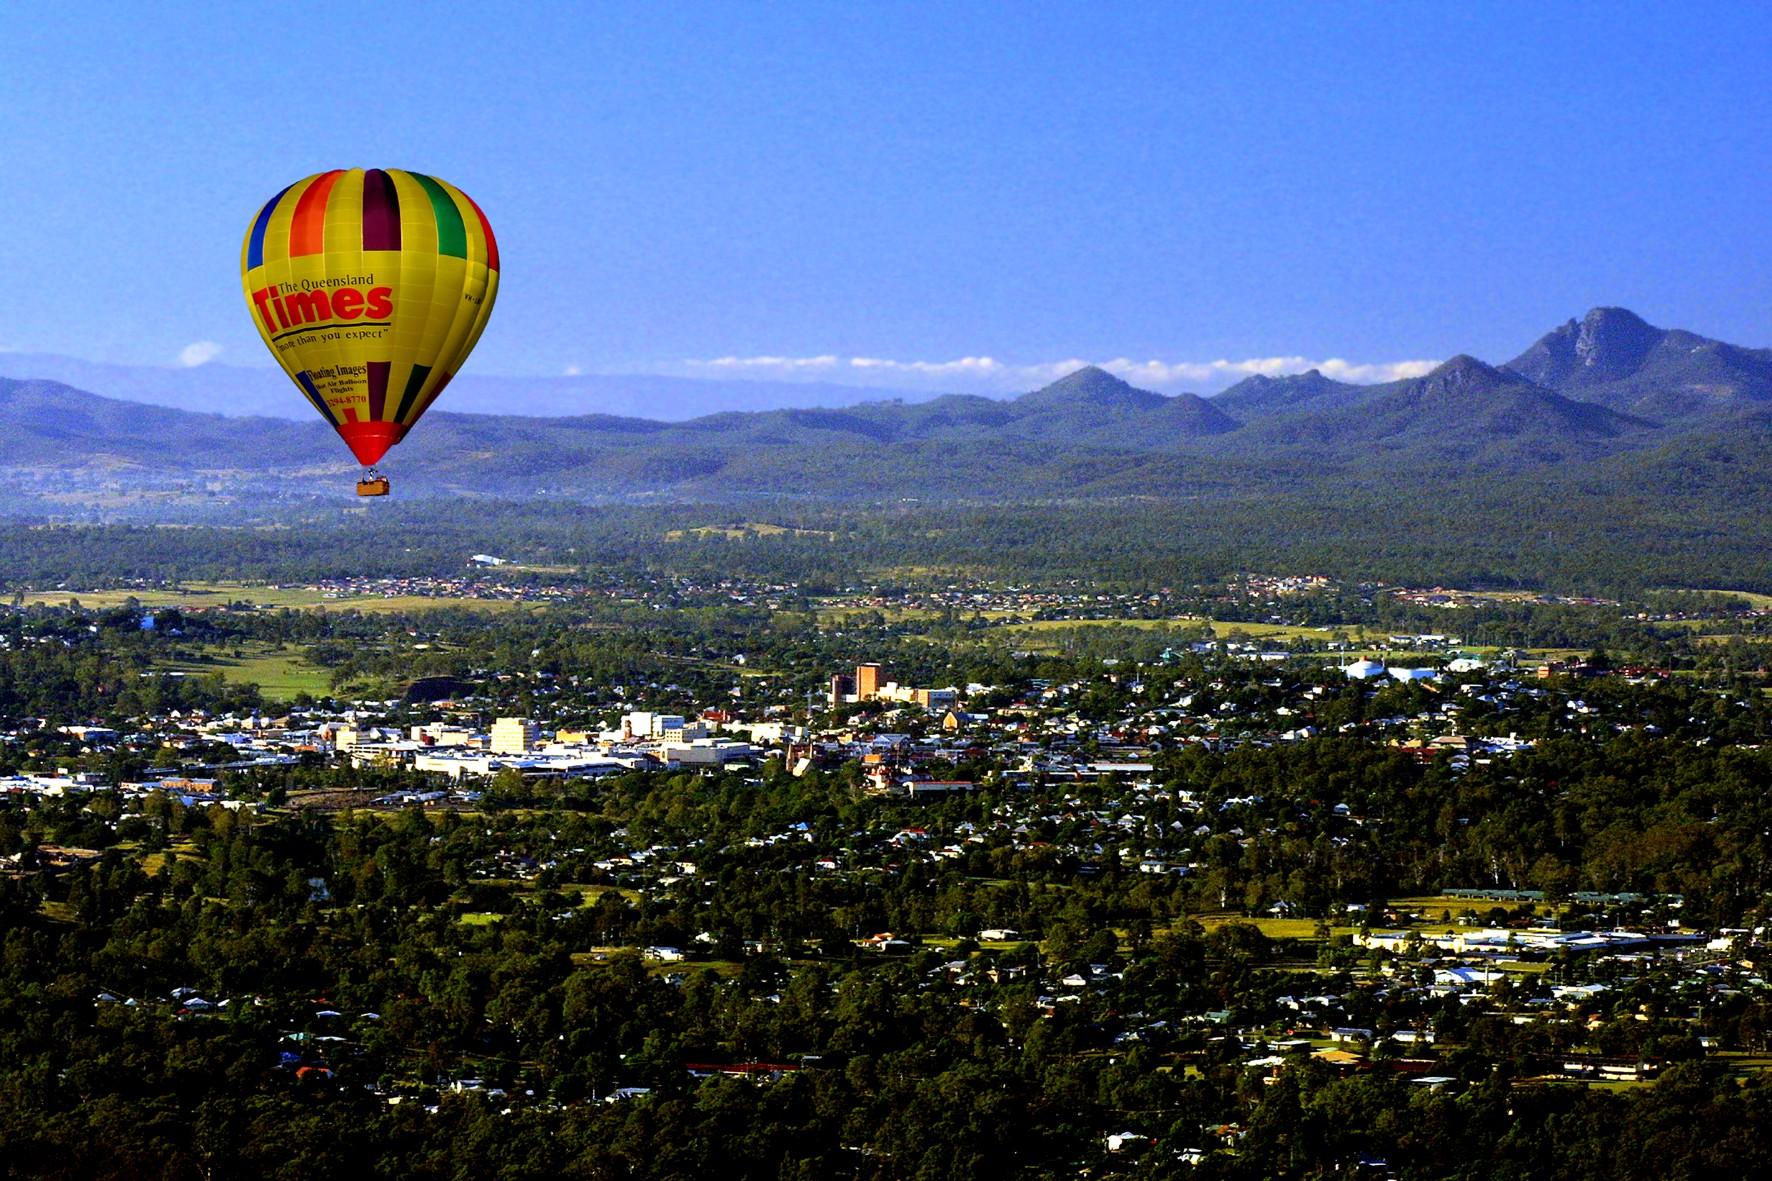 2. Greater Brisbane Scenic Hot Air Balloon Flight Only - 1 Hour Flight, No Breakfast & Self Drive